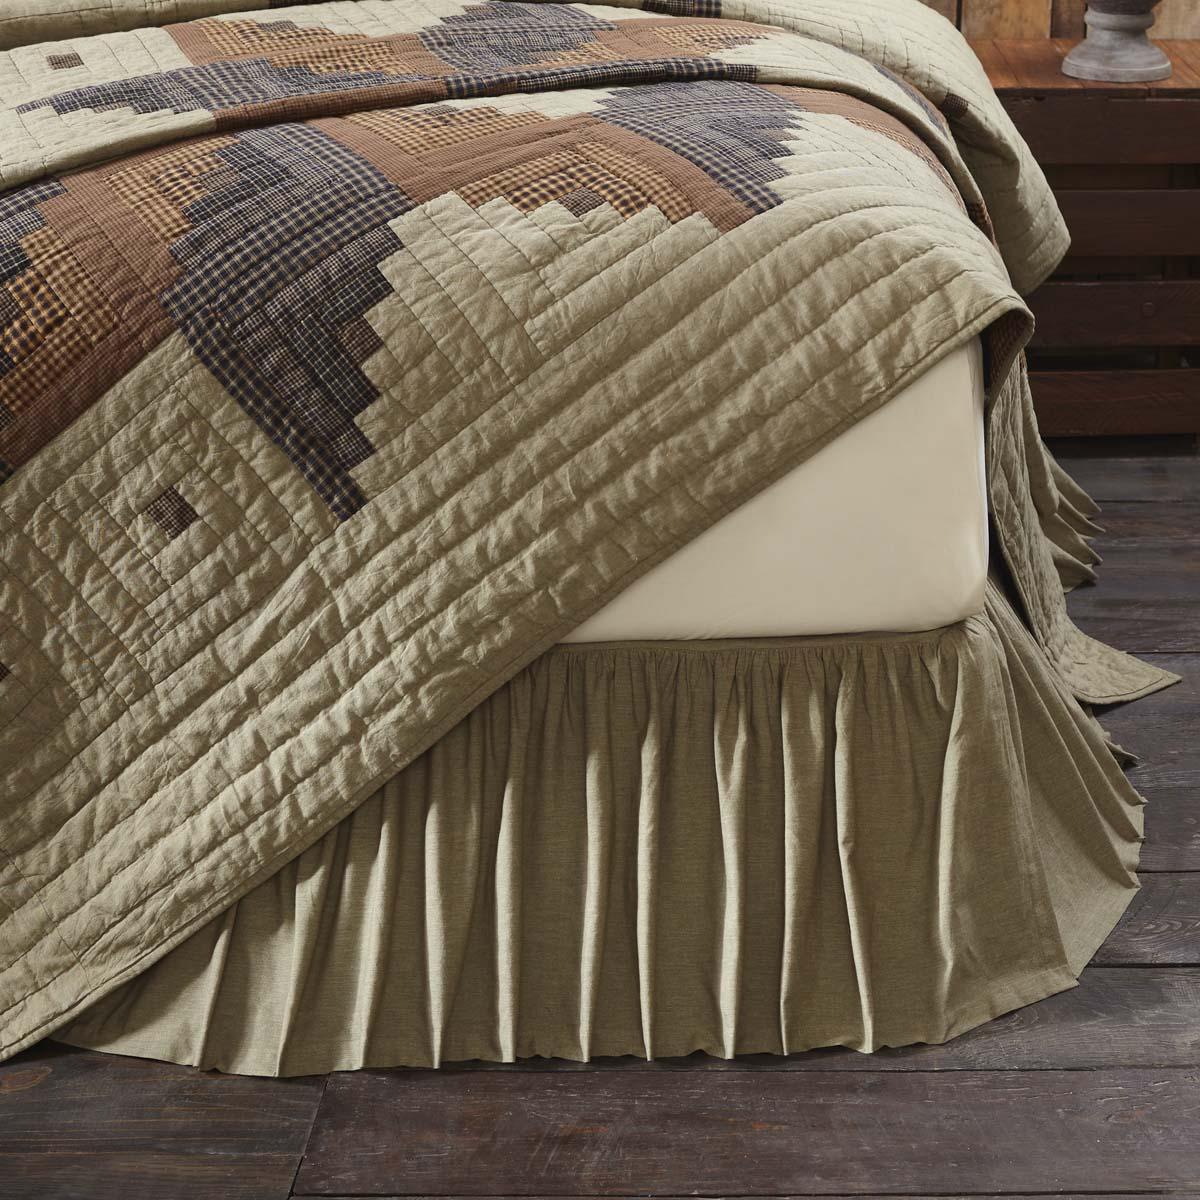 Novak King Bed Skirt 78x80x16